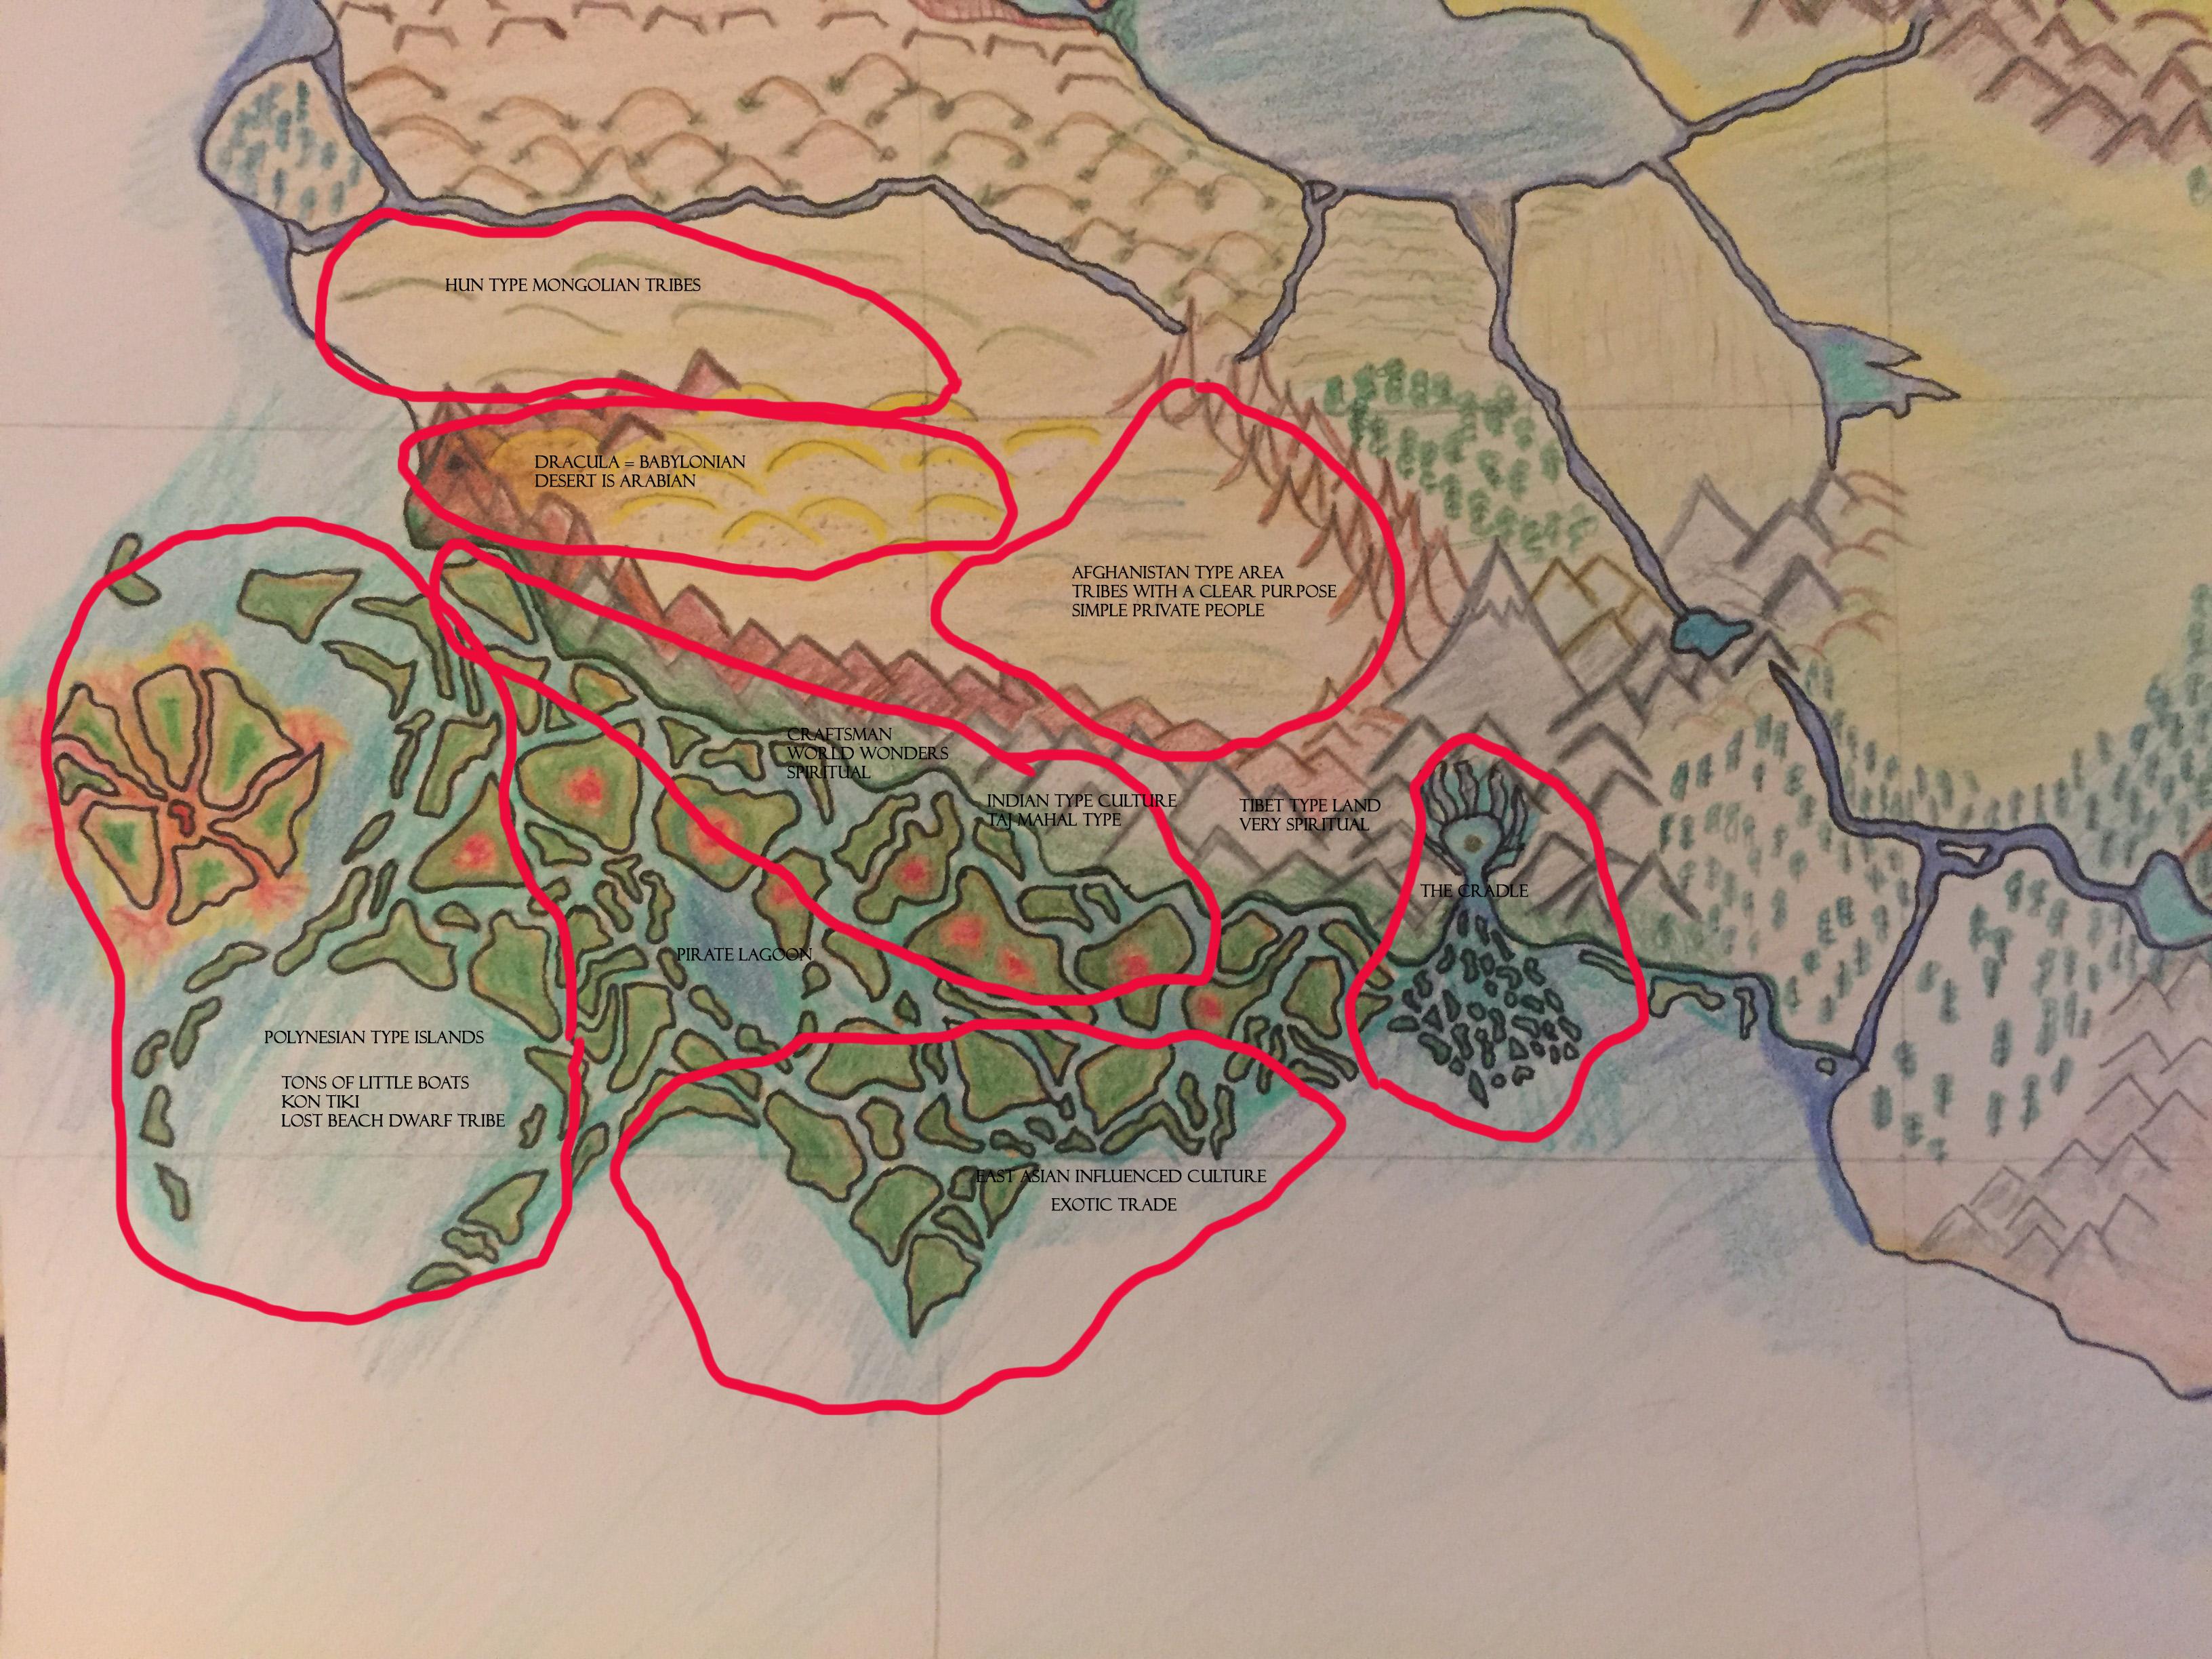 southern_land_details.jpg